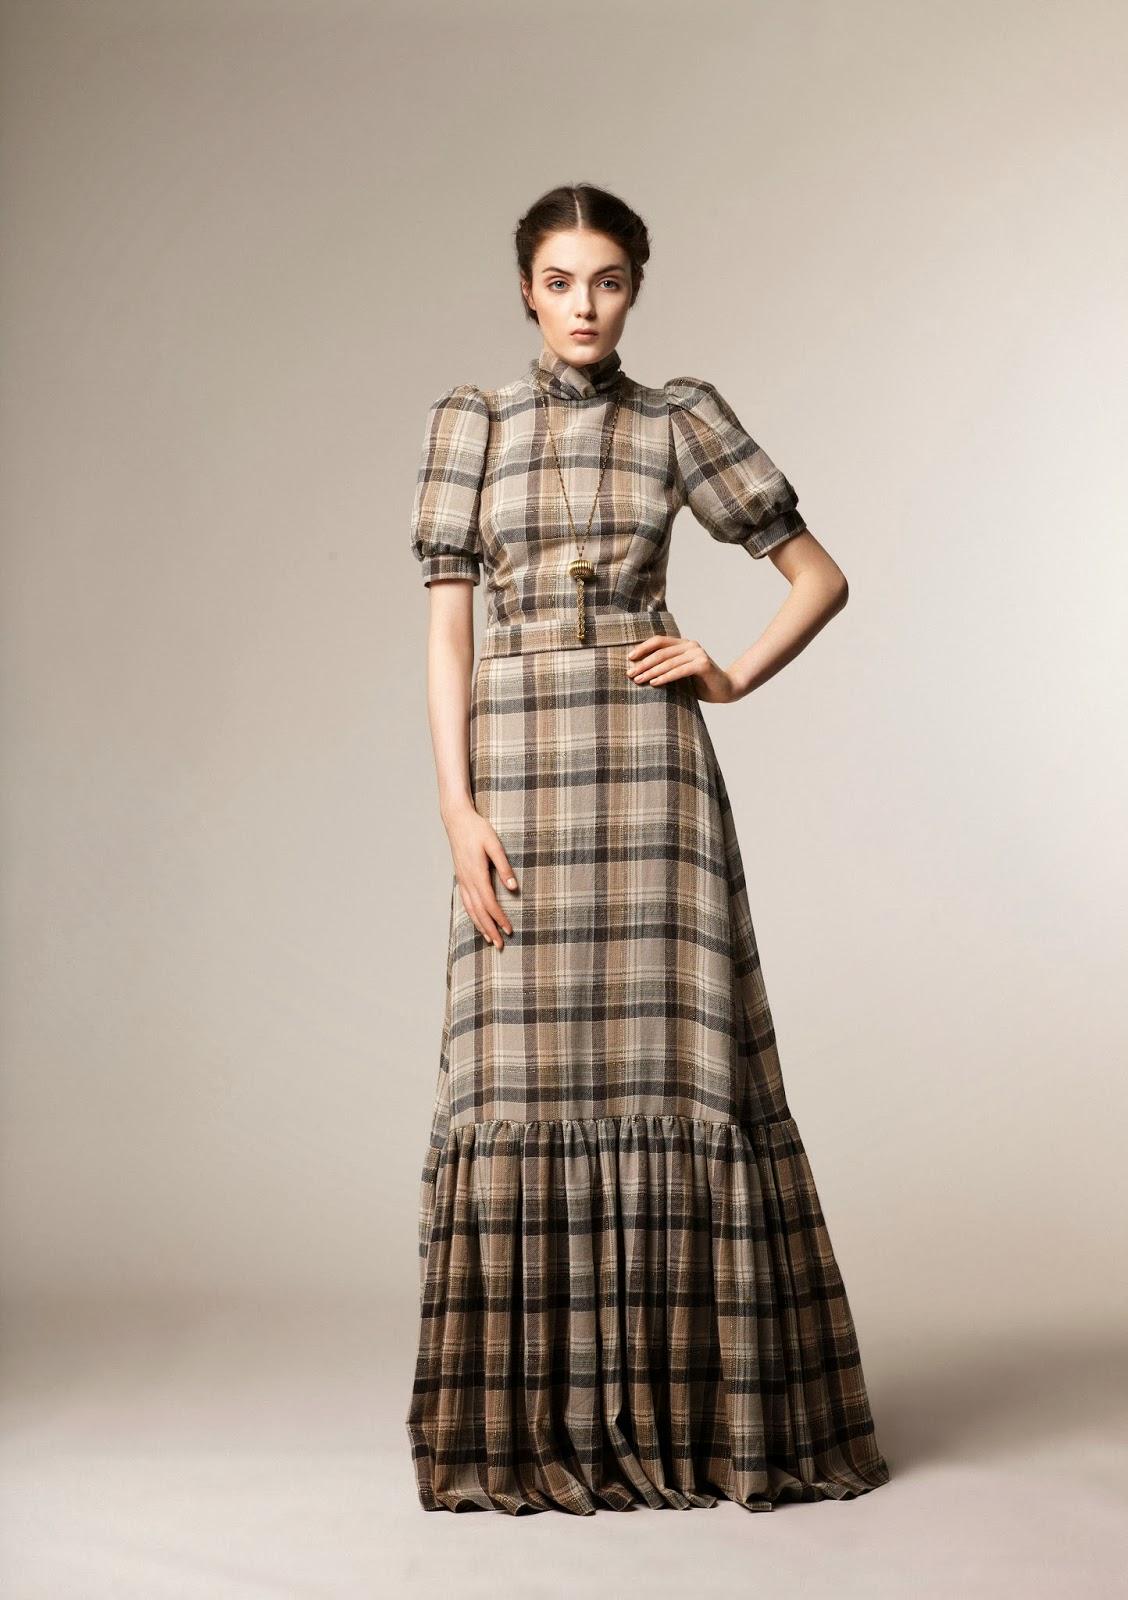 Beautiful modest A La Russe fashion winter 2013 collection   Mode-sty